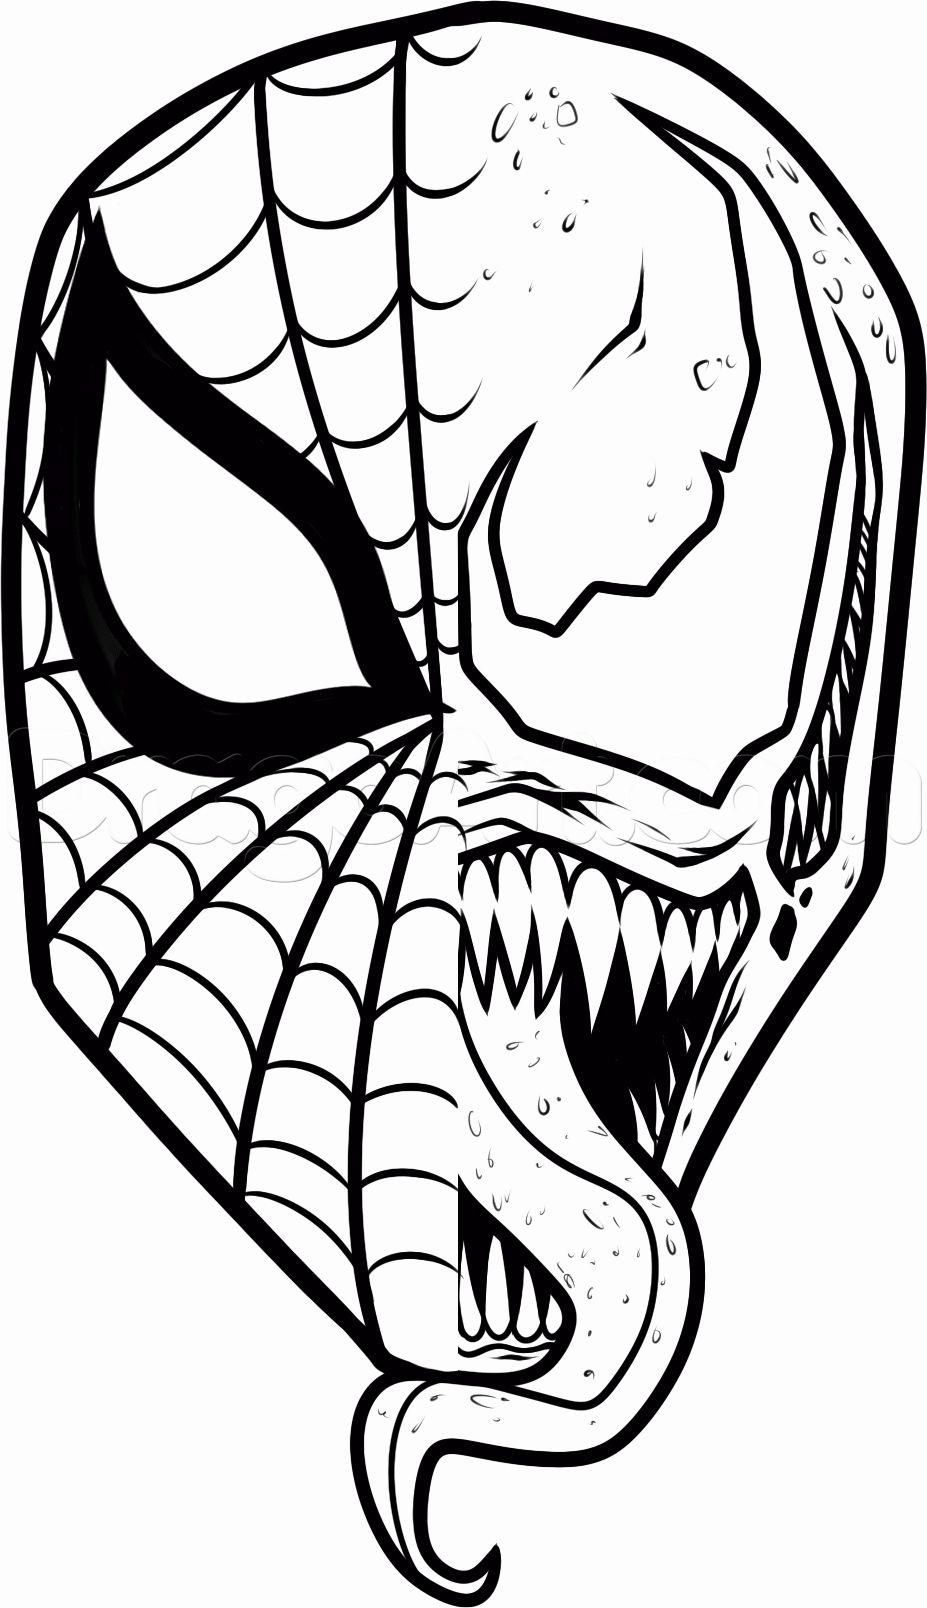 Lego Coloring Activities Best Of Batman Logo Coloring Pages And Superhero Kepek Best Of 242 Best Rock Cart Spiderman Drawing Spiderman Painting Marvel Drawings